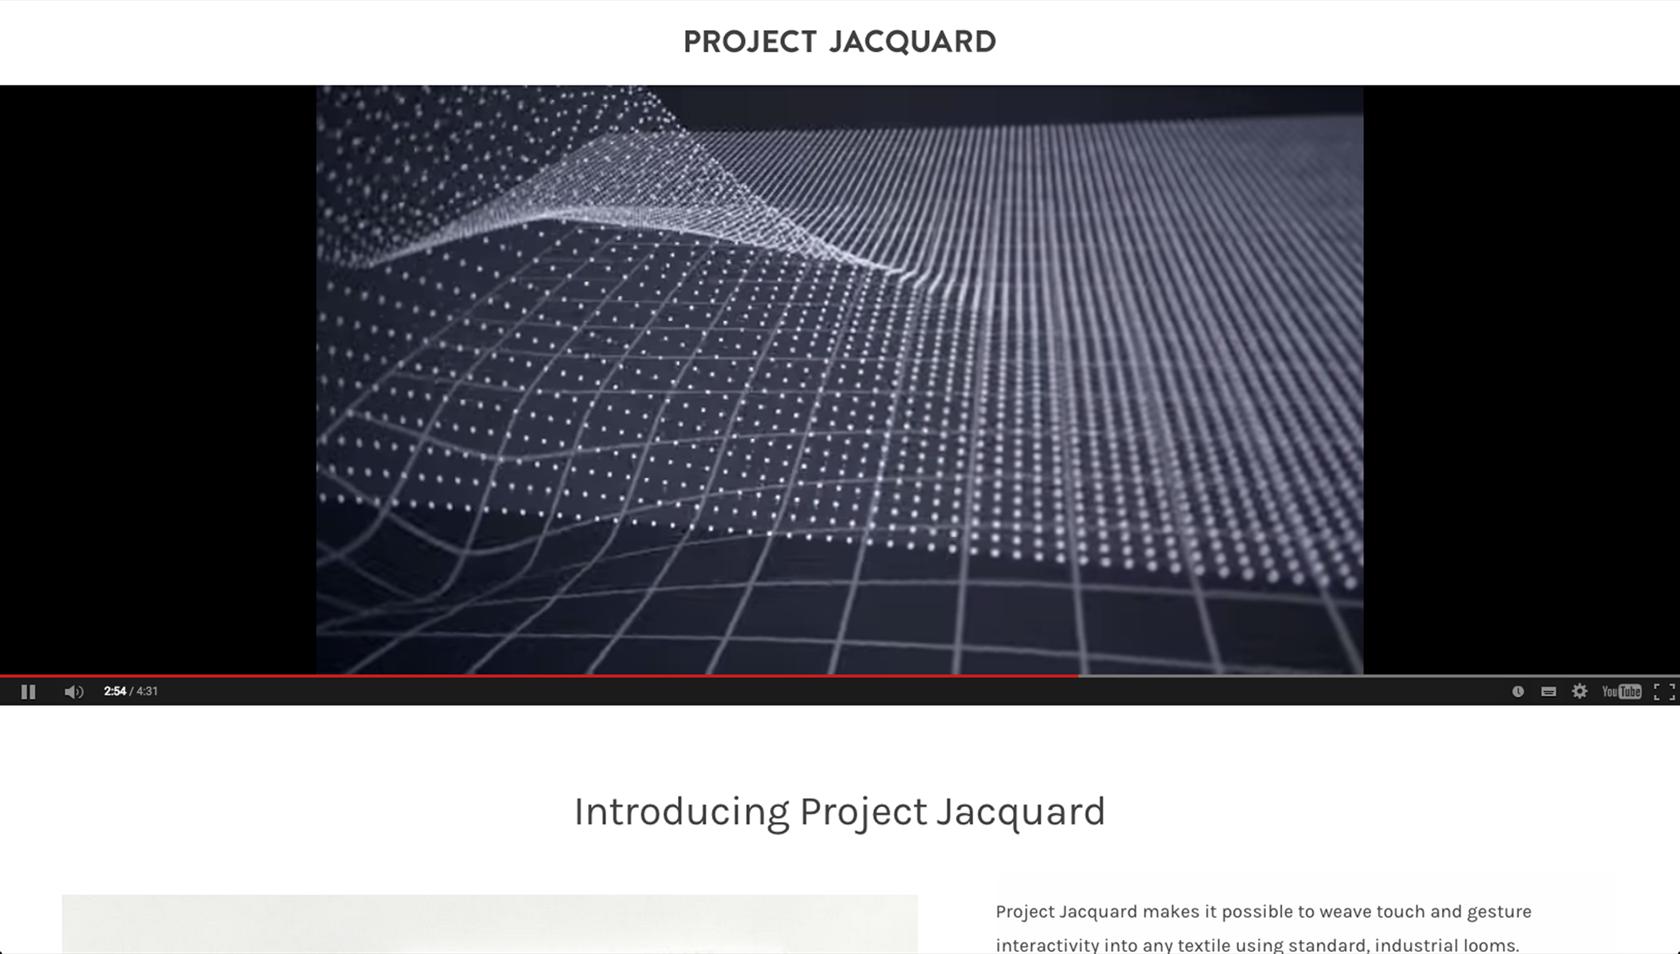 Google ATAP - Project Jacquard